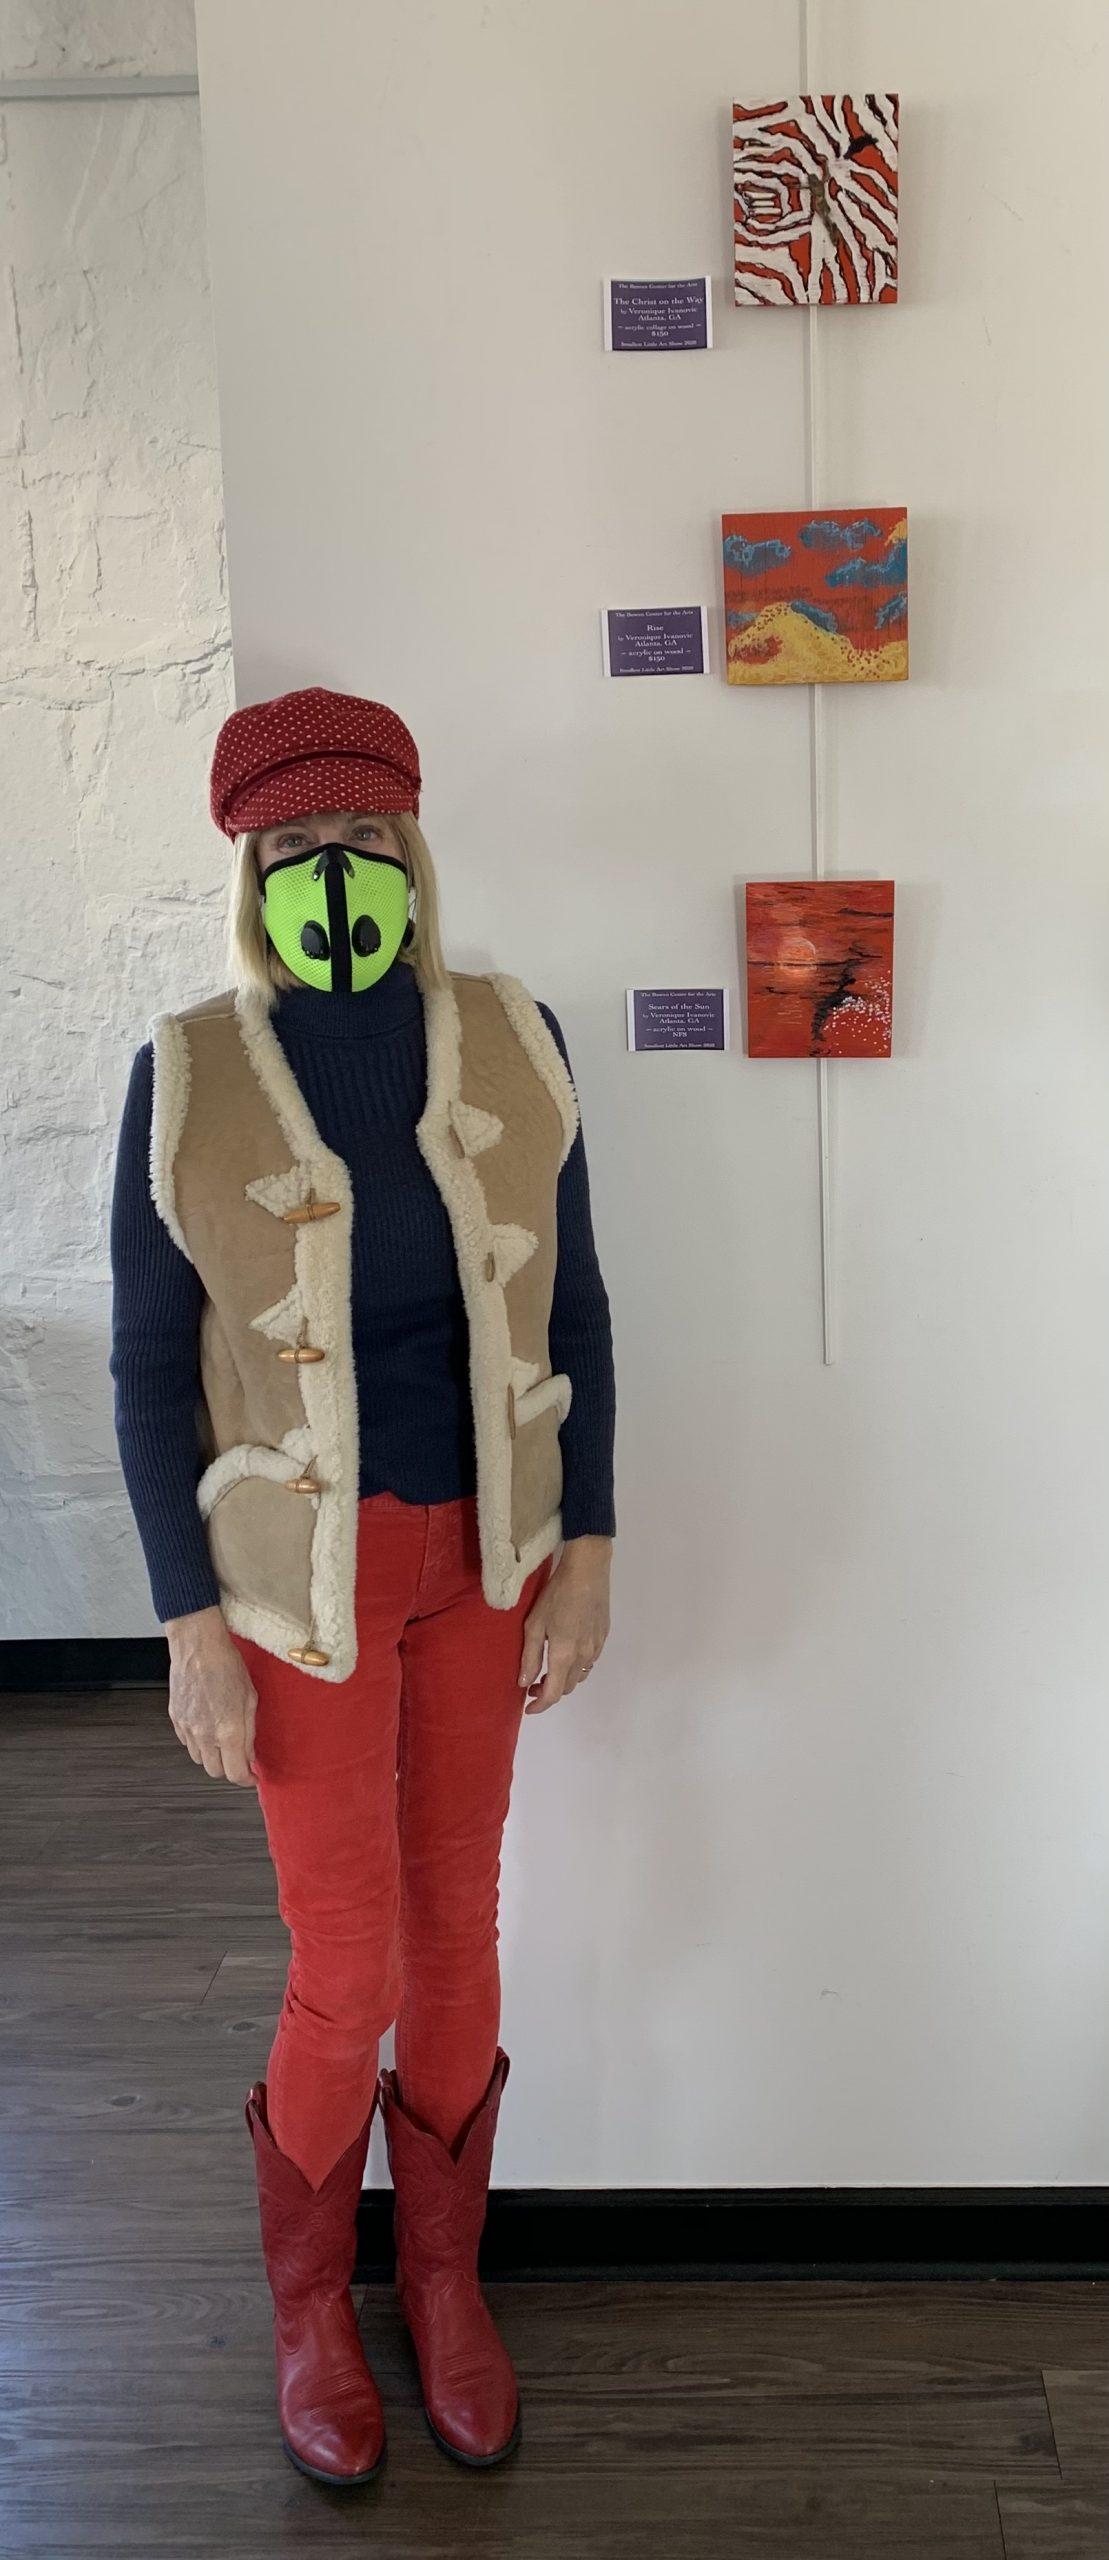 ART POP GALLERY DISPLAY 2021 SUR GOOGLE ARTS & CULTURE